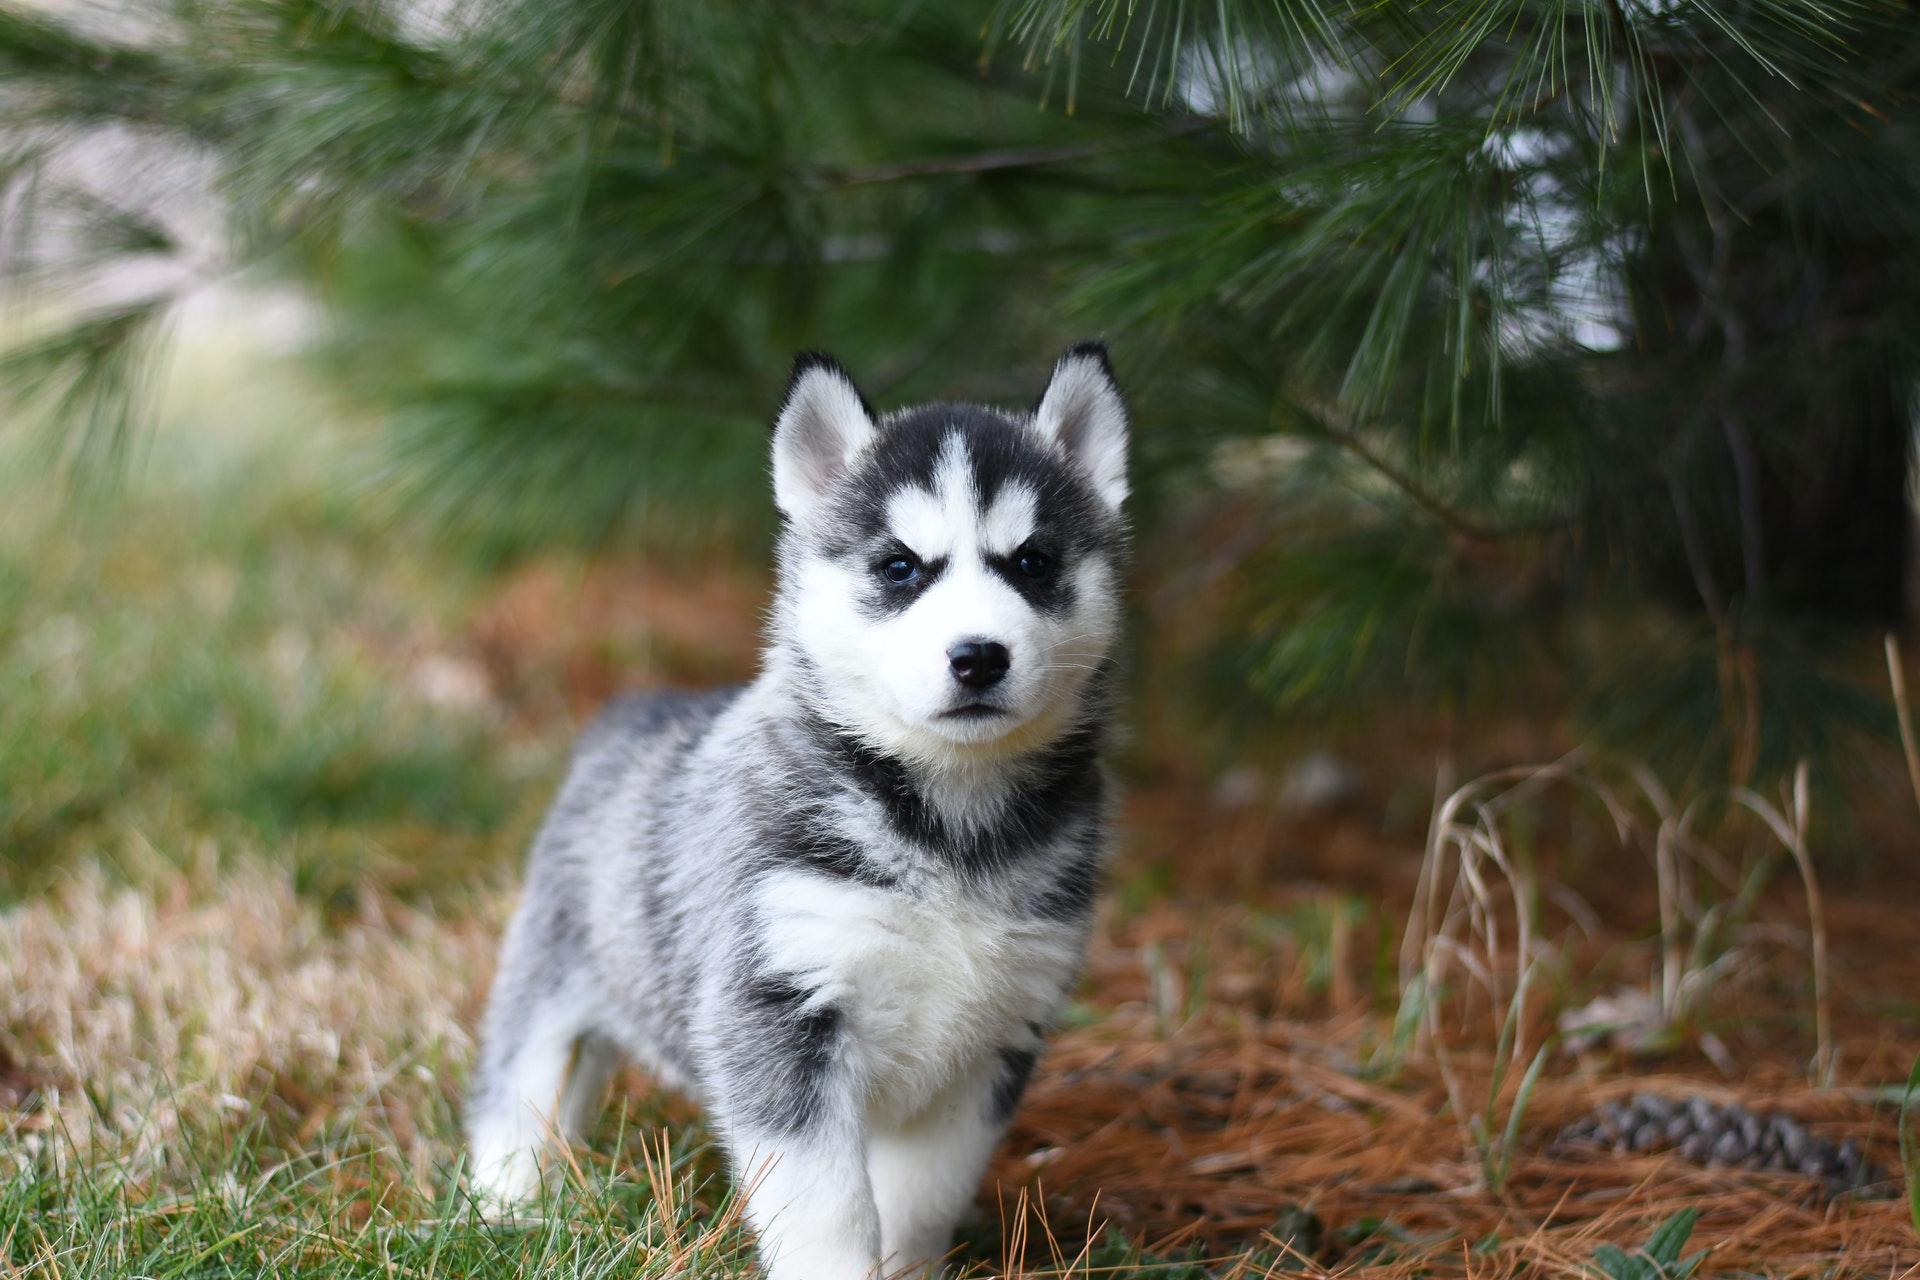 download wallpaper: husky puppy wallpaper